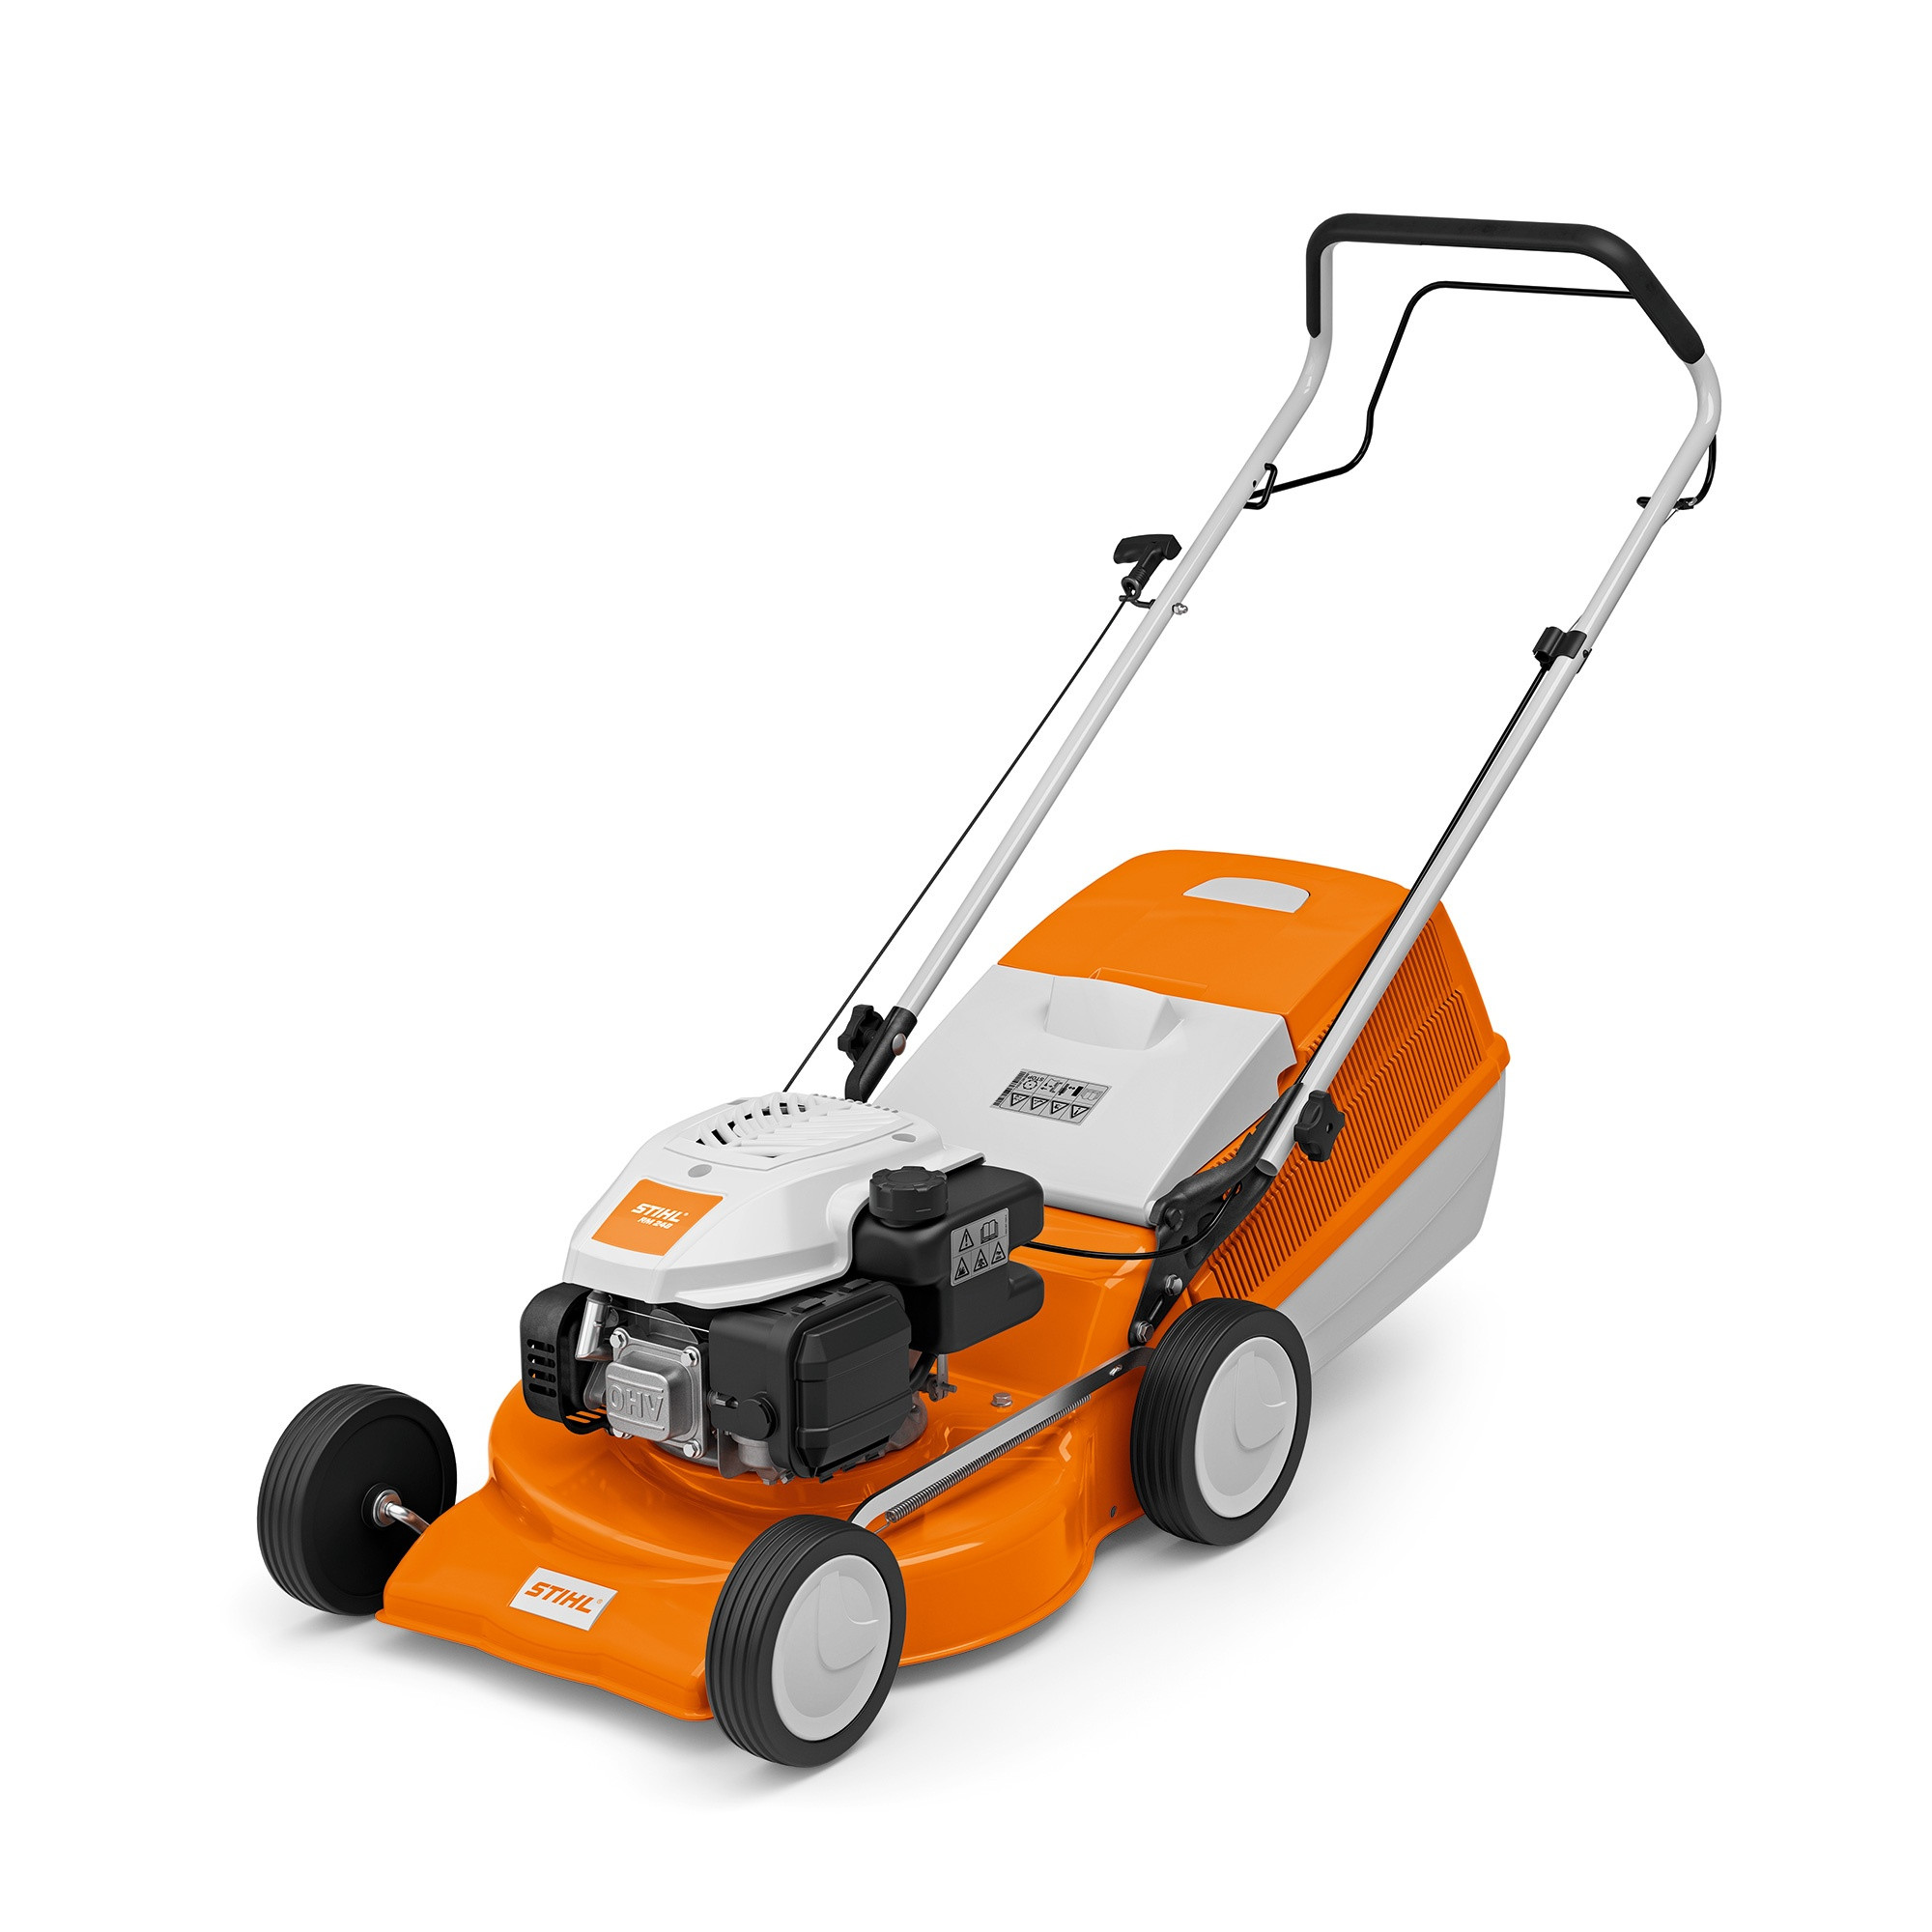 Petrol Lawn Mower, STIHL 63500113420, RM248, 2.8HP, 2900rpm, 46cm cutting width